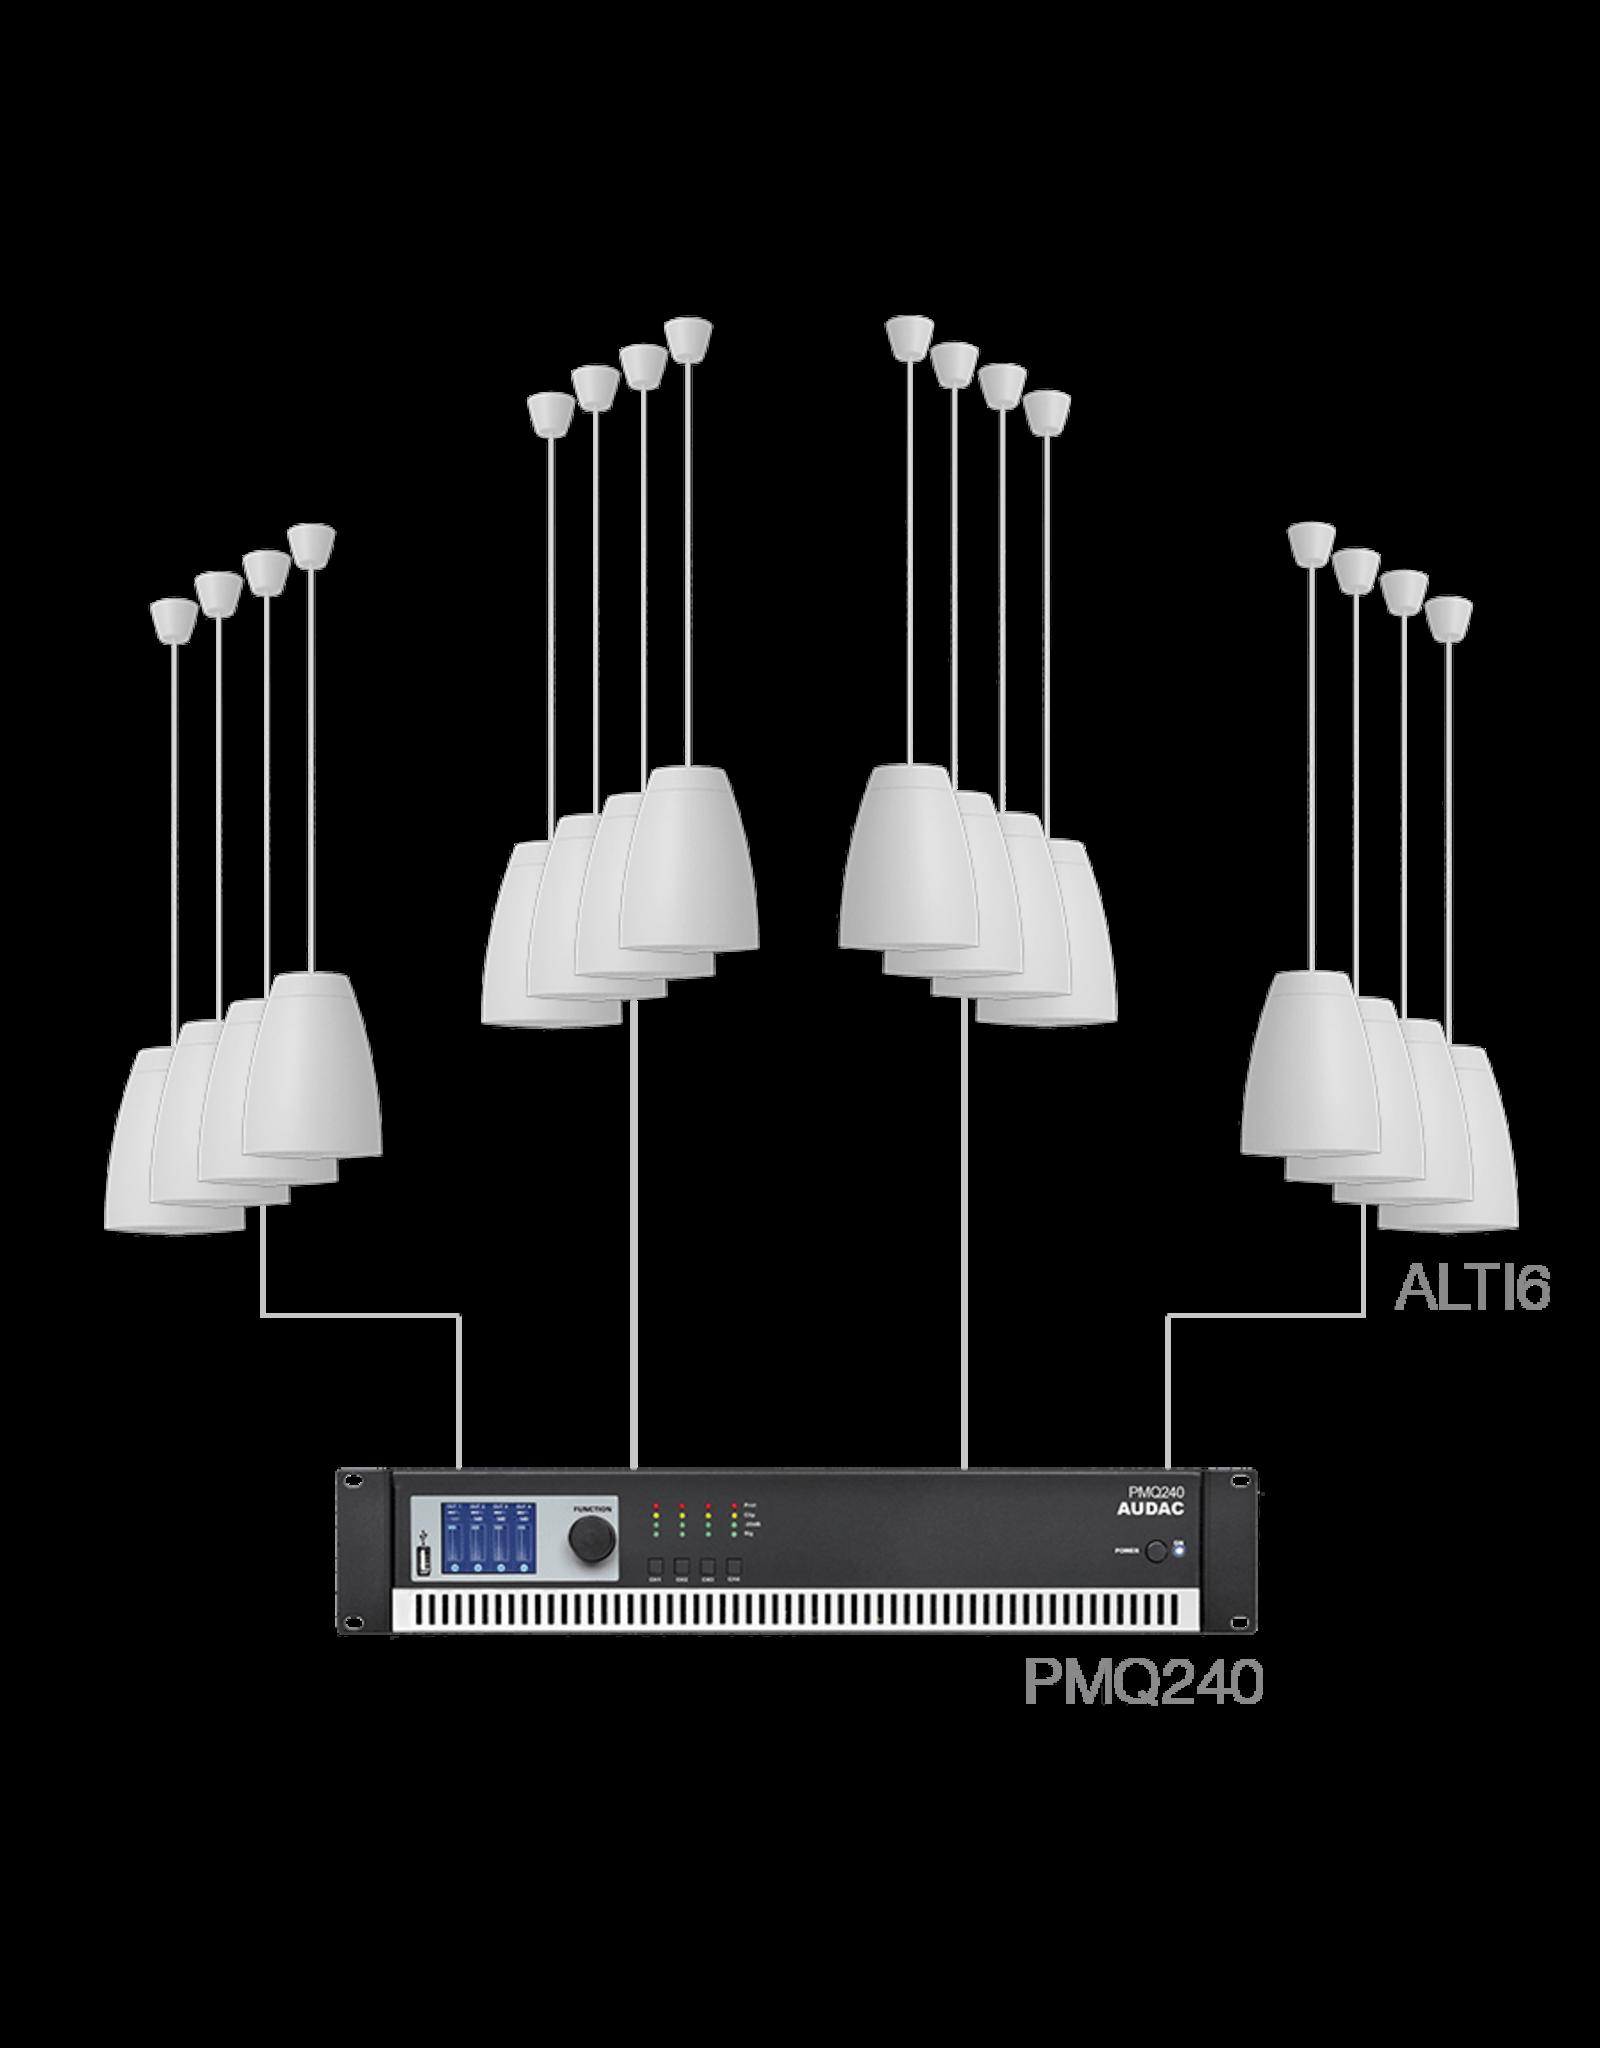 Audac 16 x ALTI6 + PMQ240 White